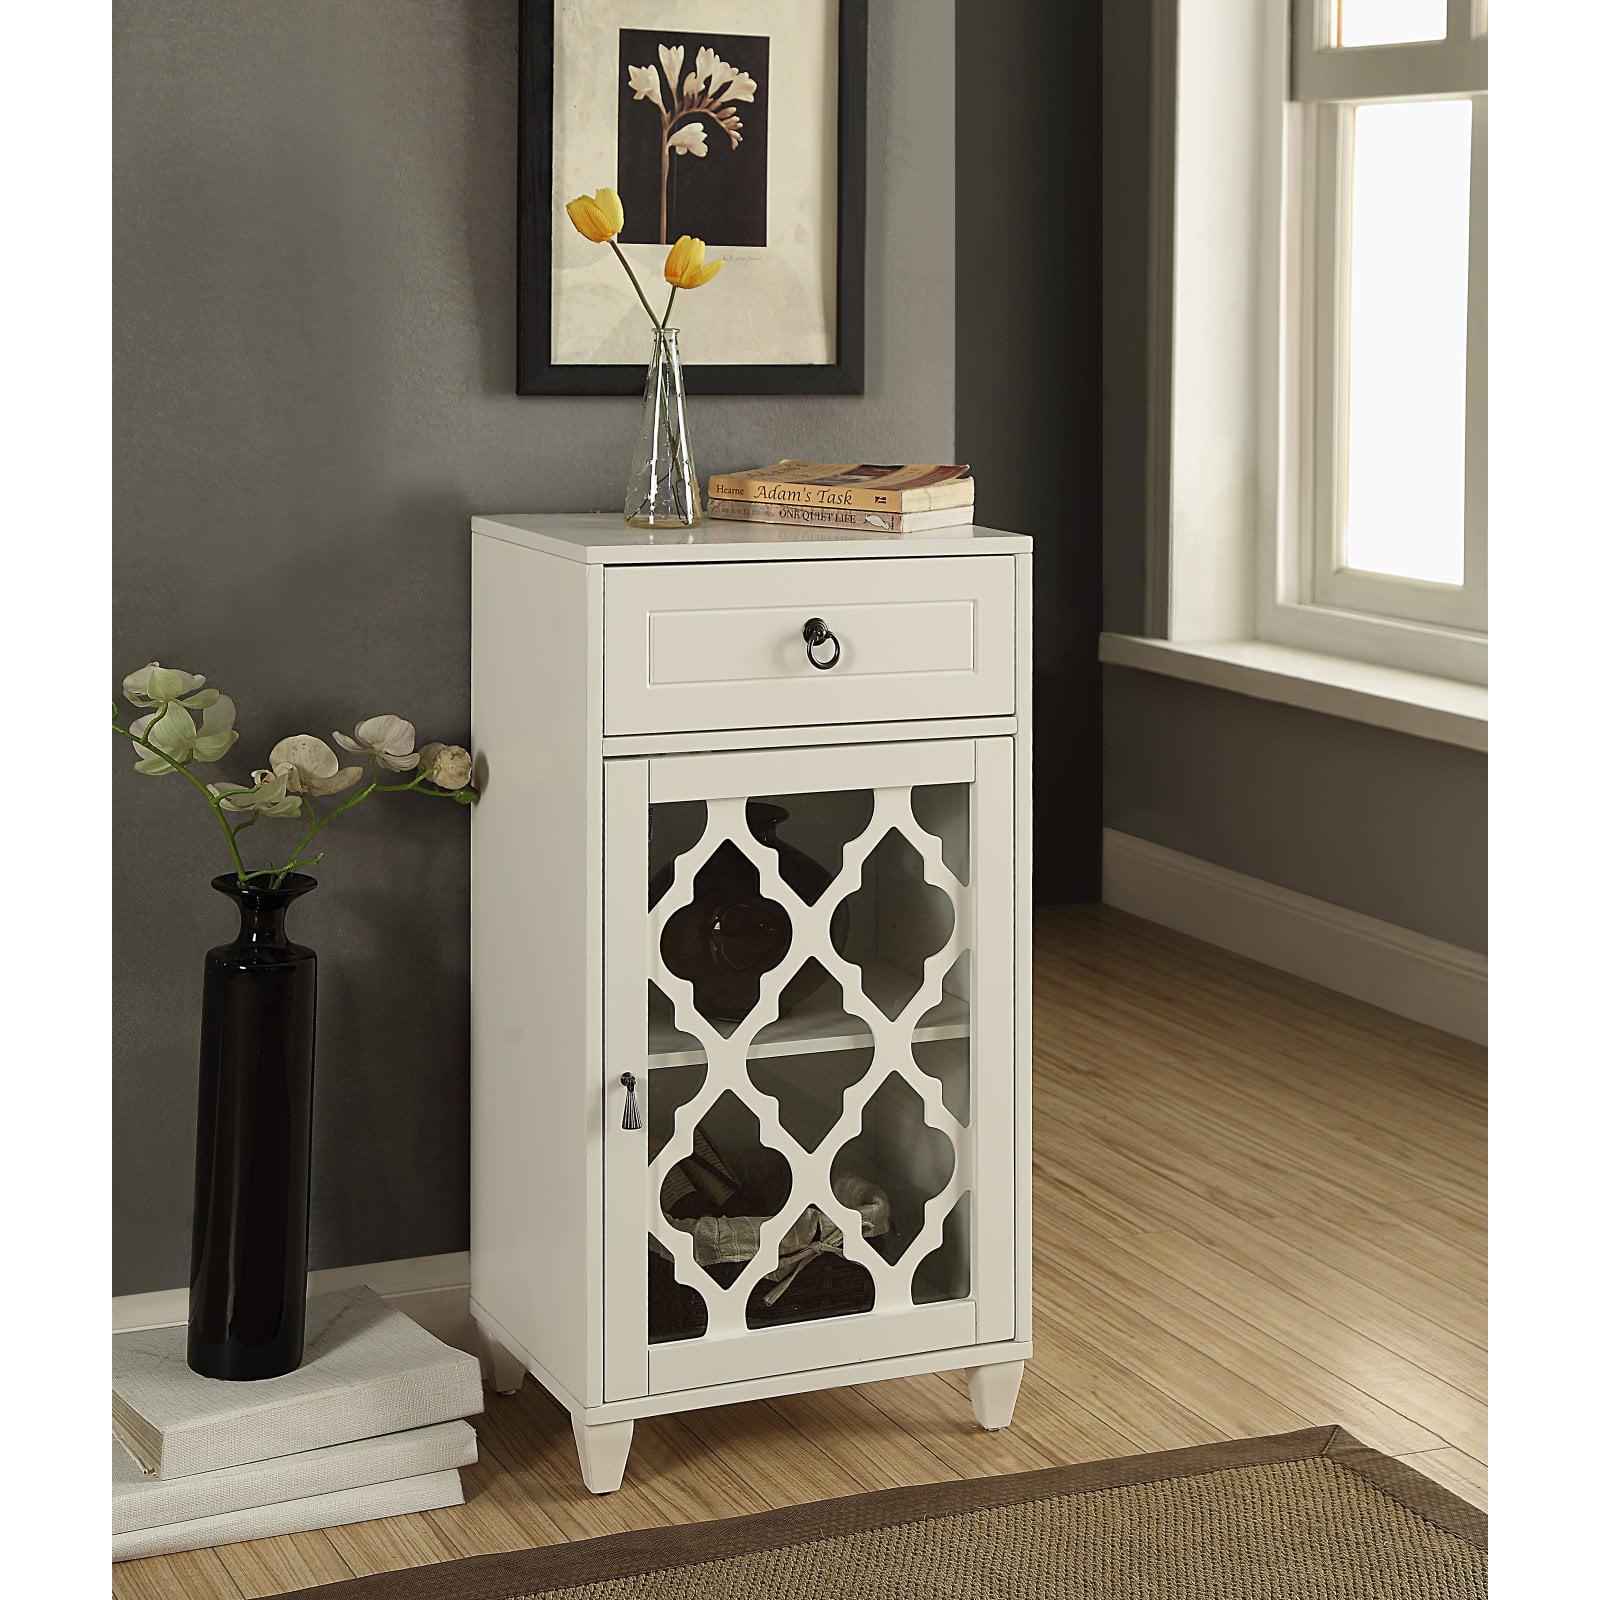 ACME Ceara Floor Cabinet, White